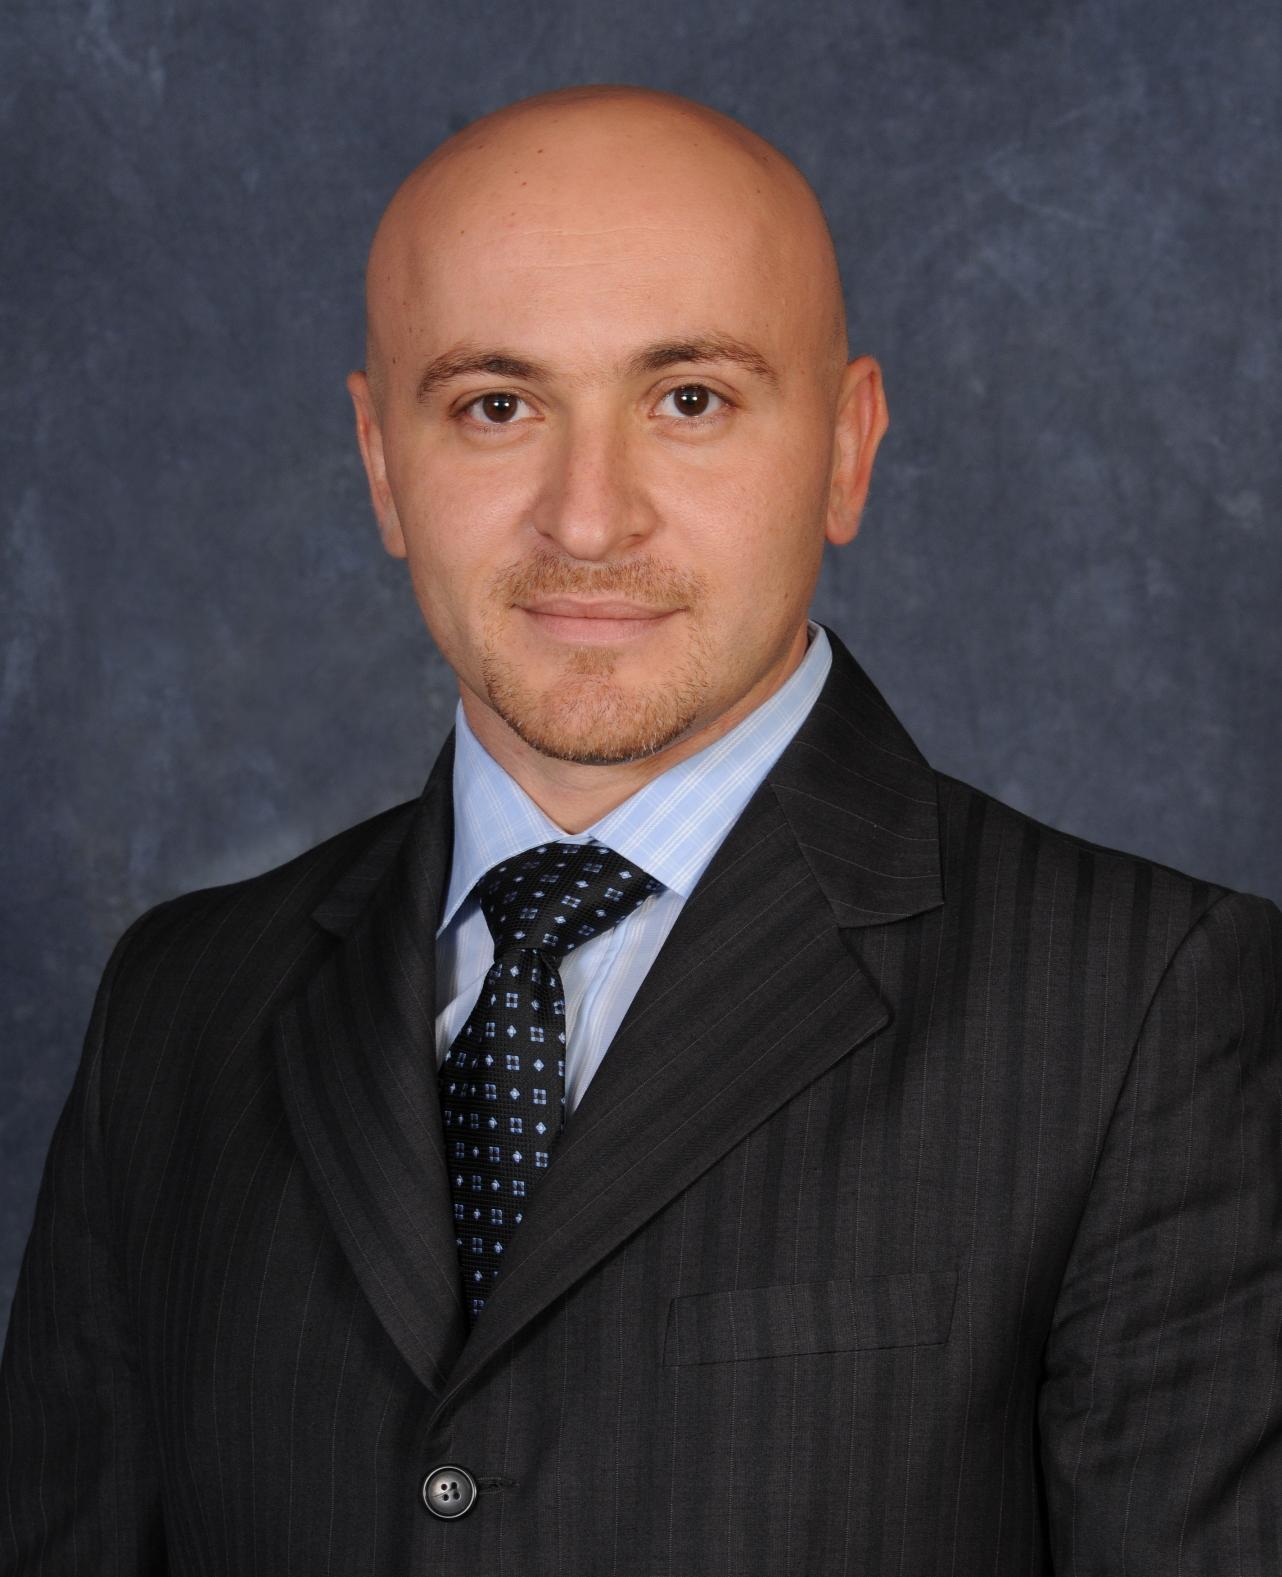 Joseph Adel, MD